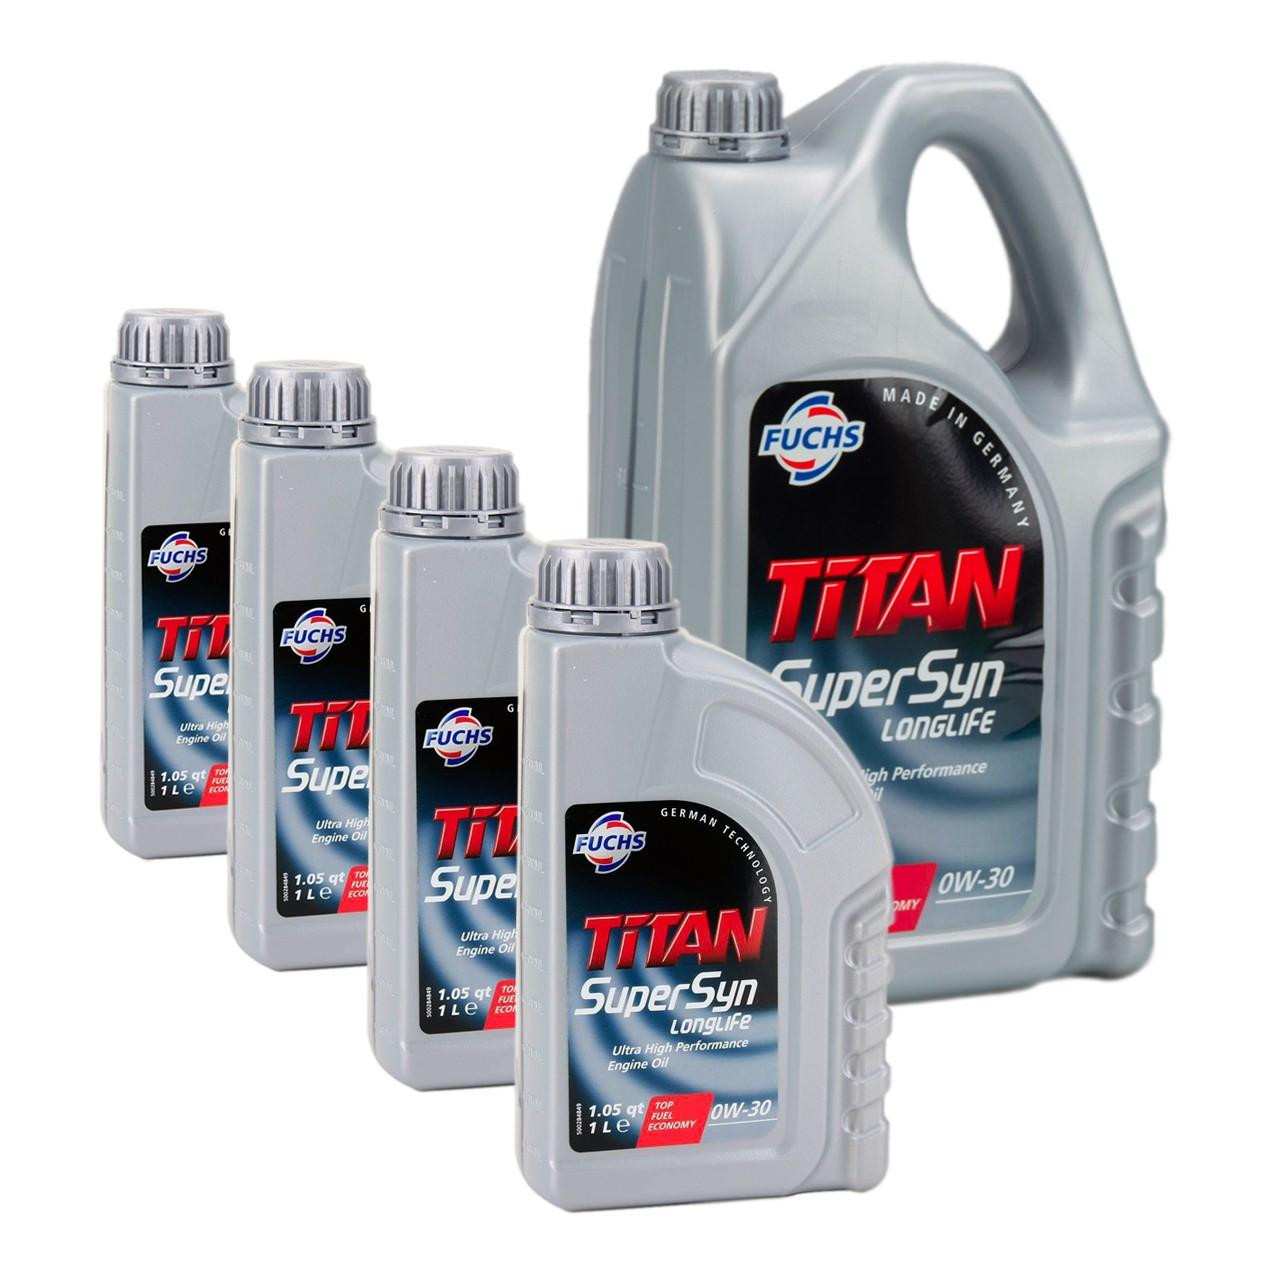 FUCHS Motoröl ÖL TITAN SUPERSYN LONGLIFE 0W30 MB 229.5 VW 502/505.00 - 9 Liter